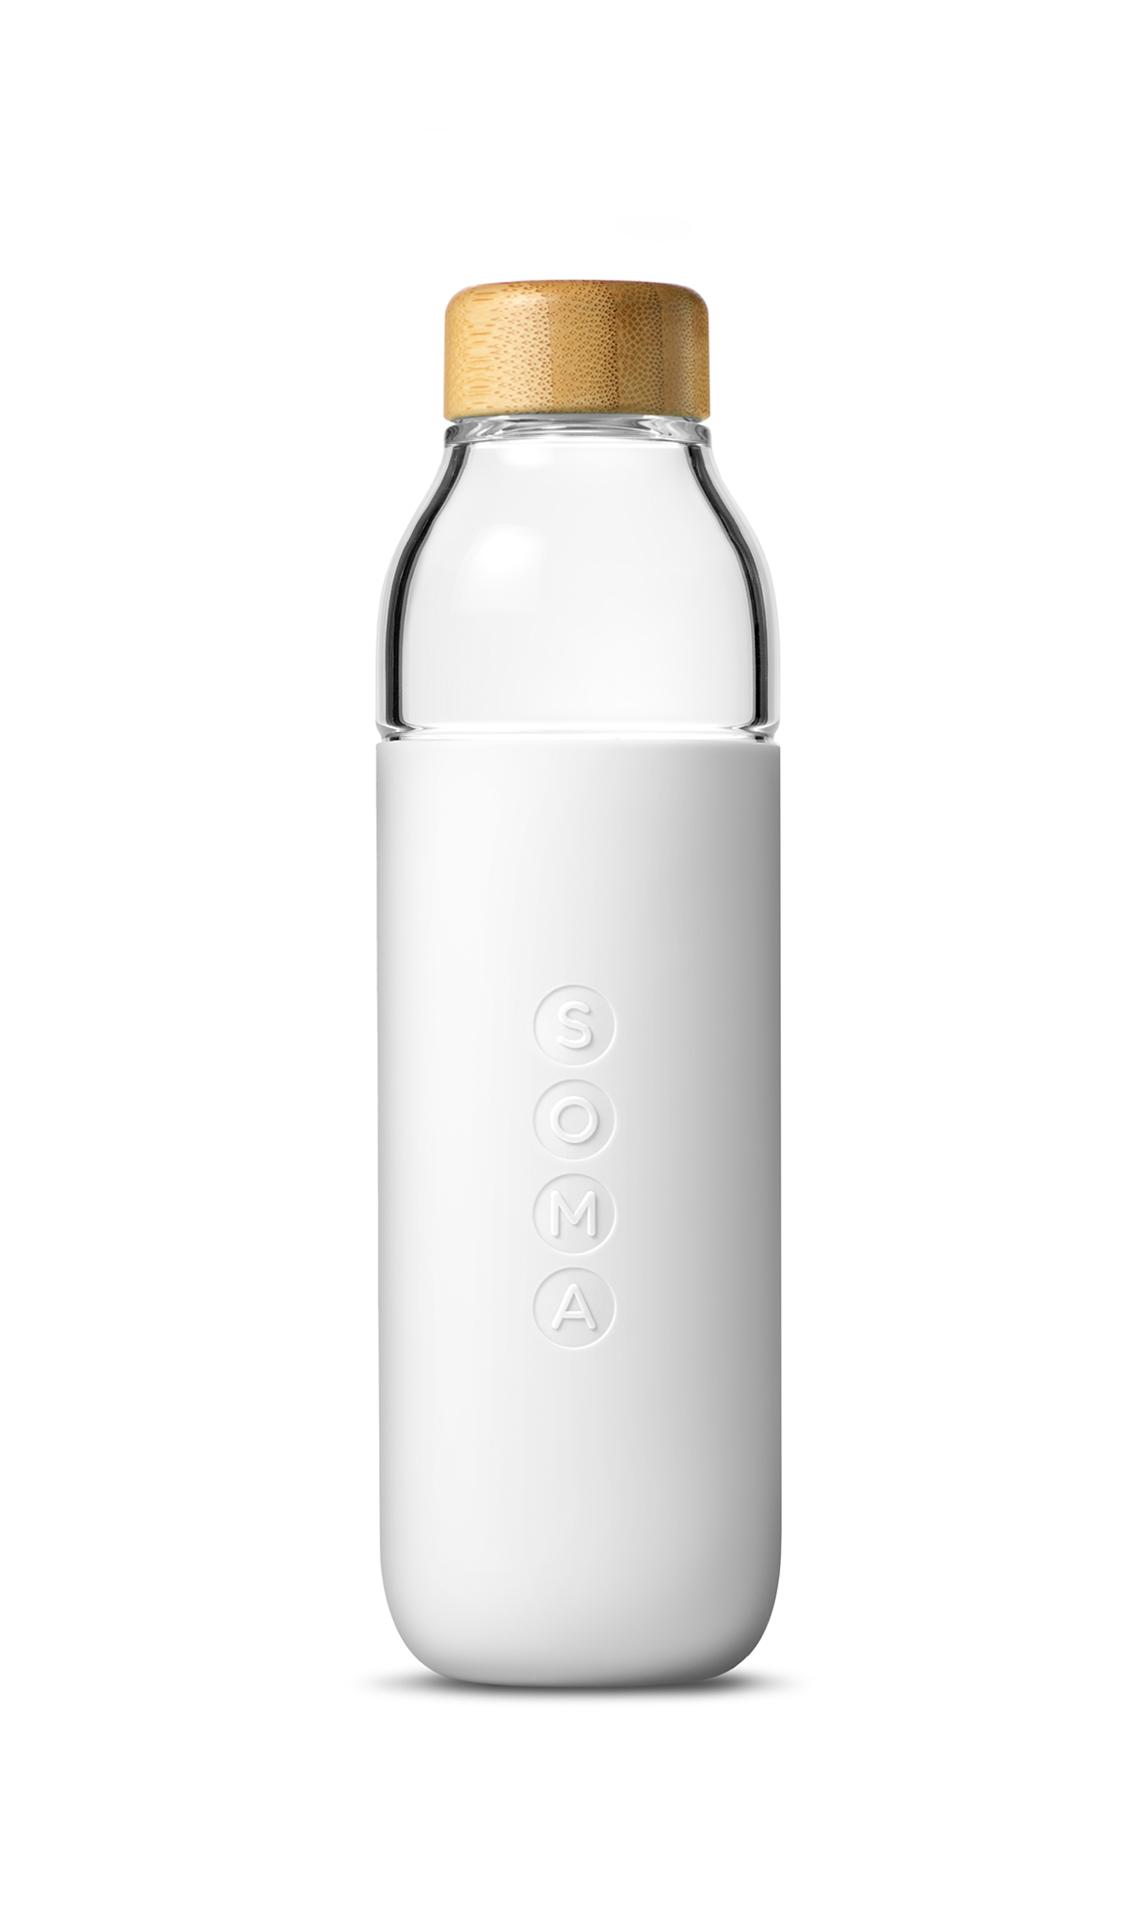 Water Bottle Png Images Free Download Bottle Water Bottle Water Bottle Free